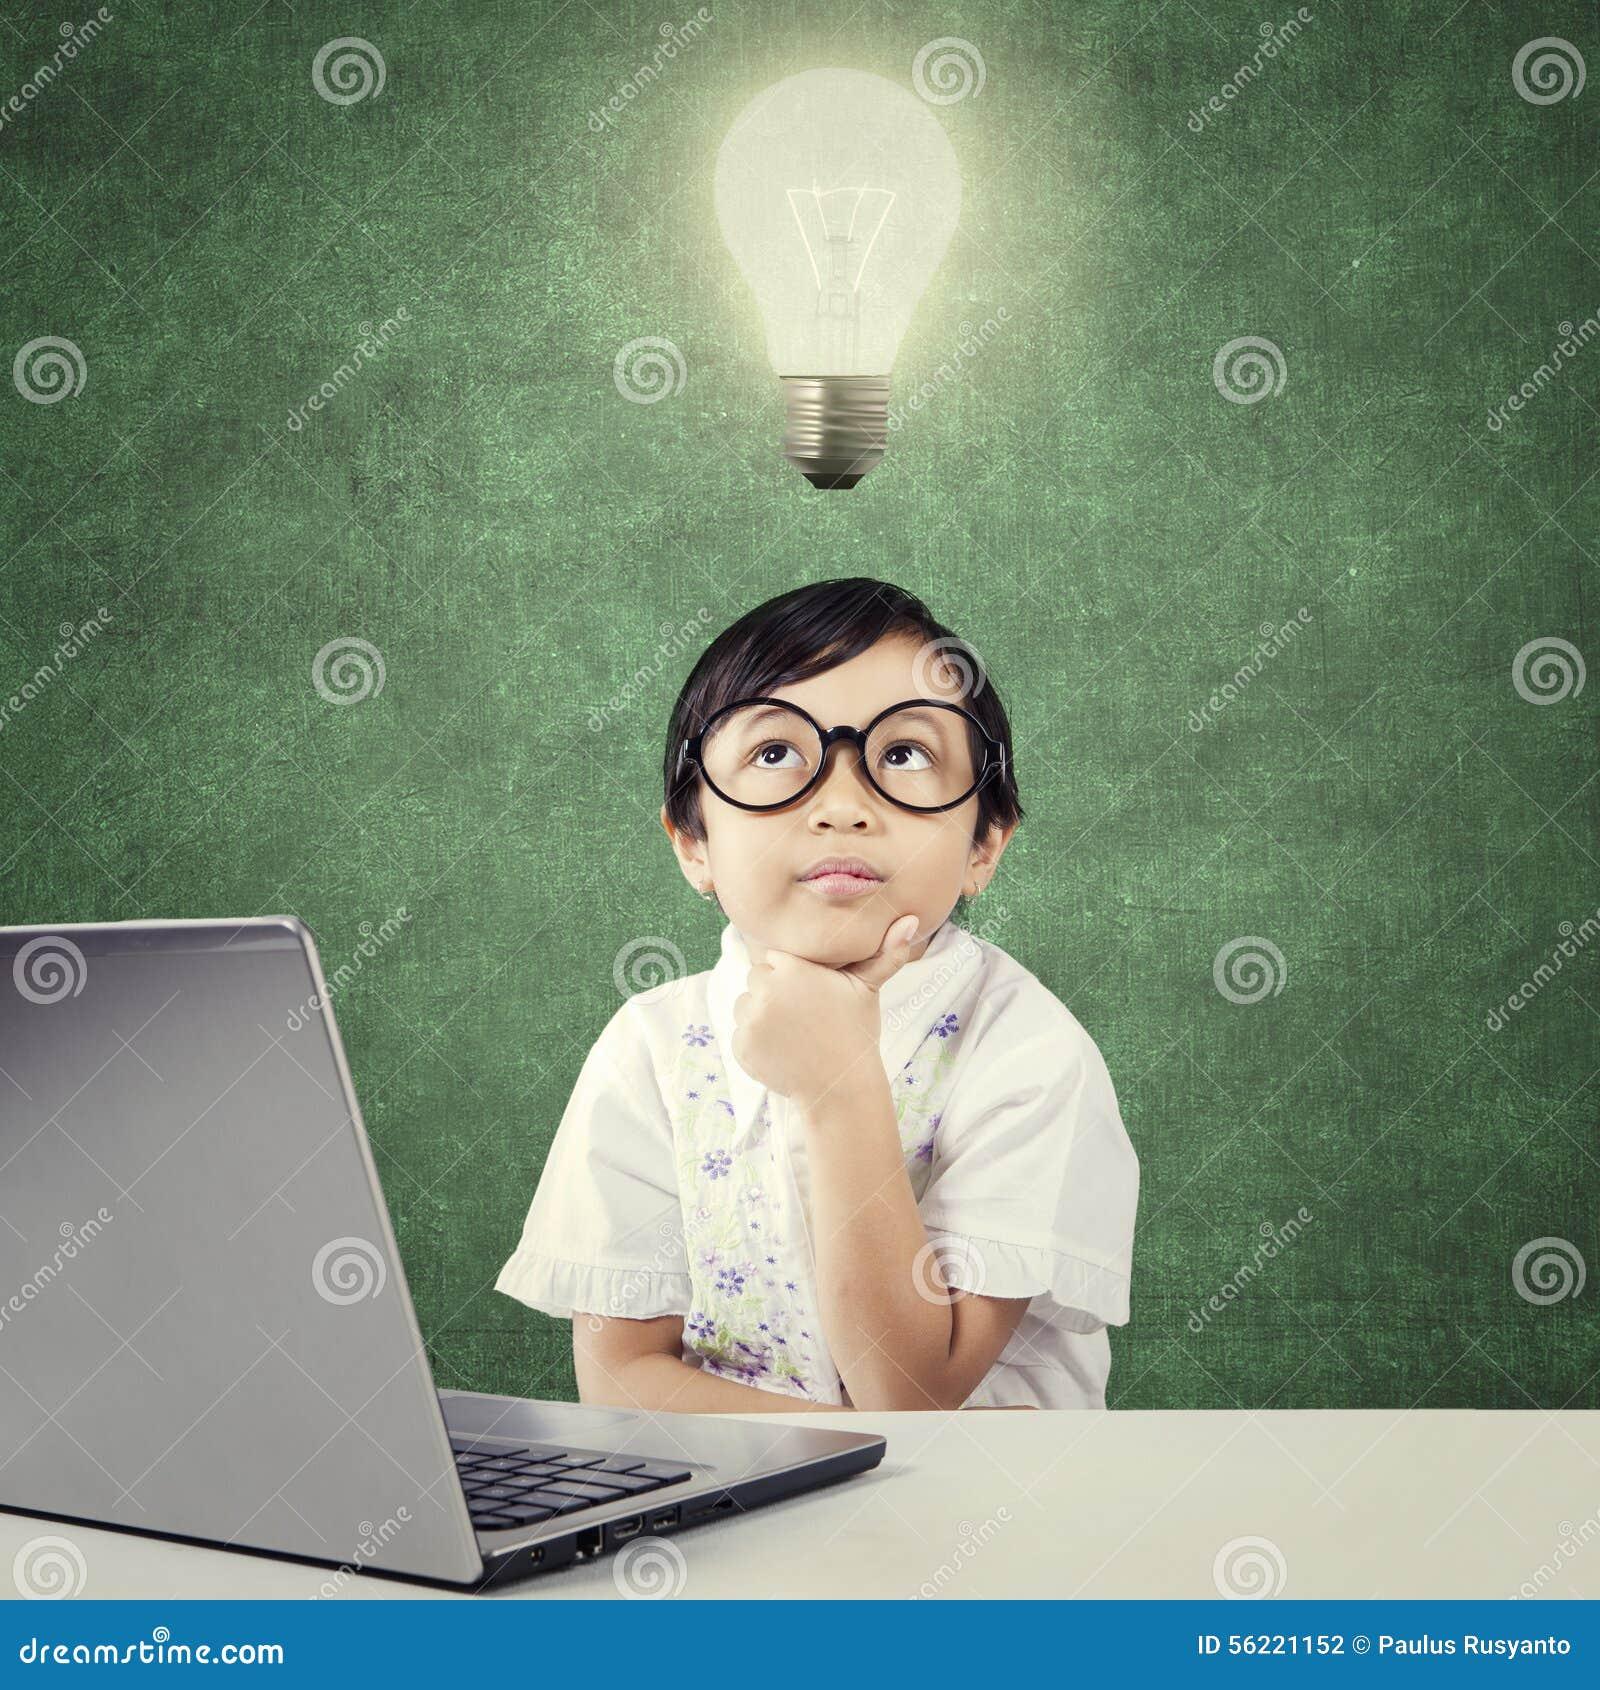 Genius Child With Laptop Thinks Idea Under Lamp Stock